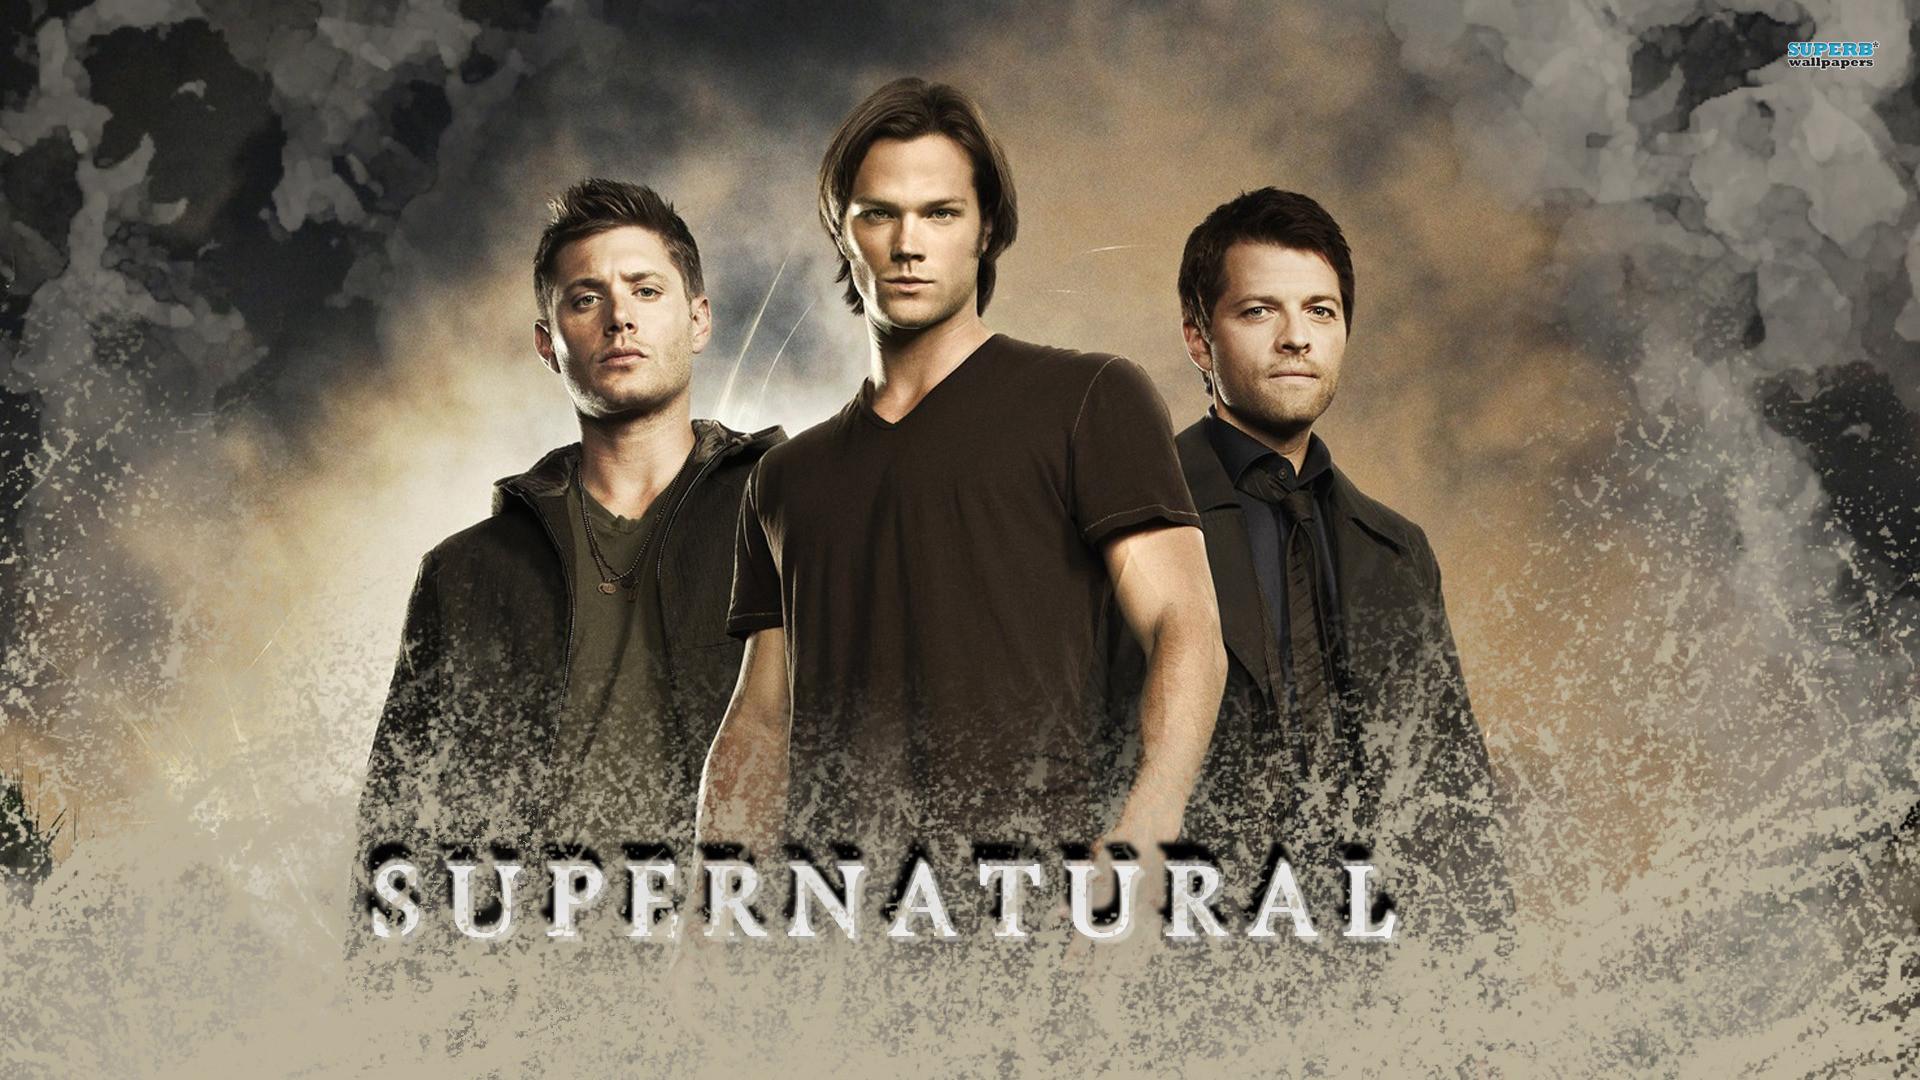 supernatural desktop wallpapers hd sam dean castiel